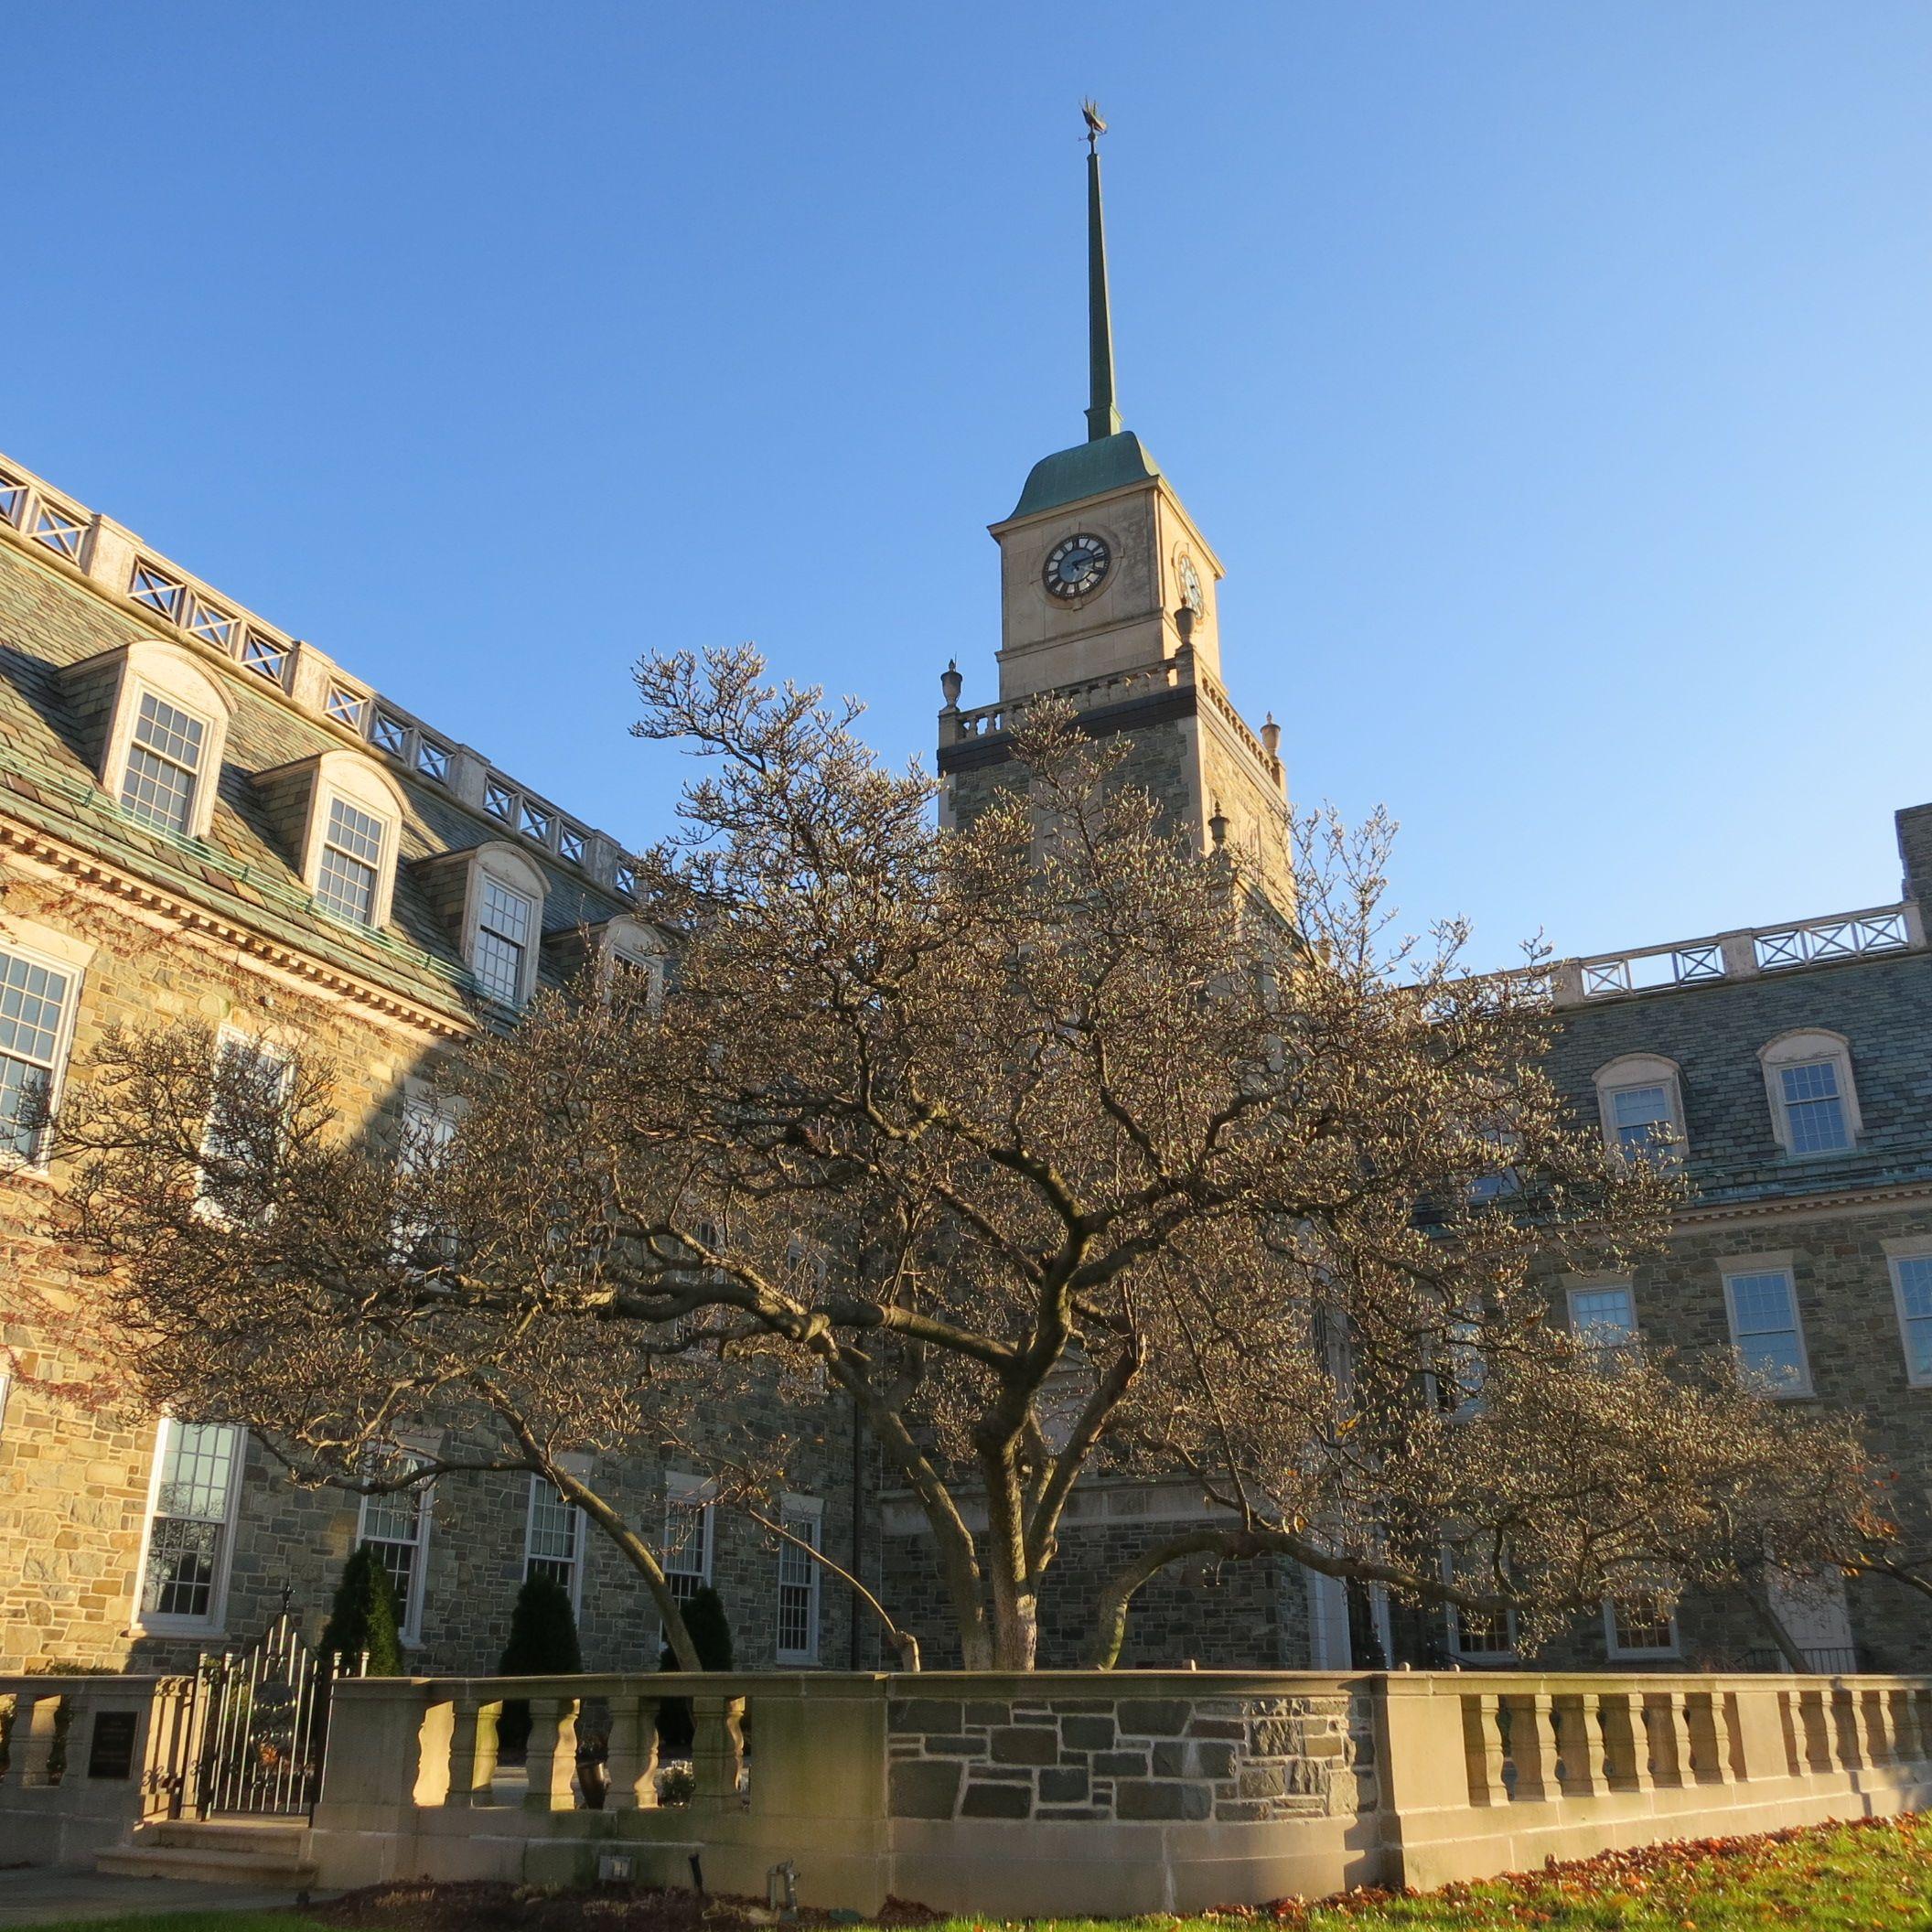 K Pok House Sute Architect: Poughkeepsie Journal Building